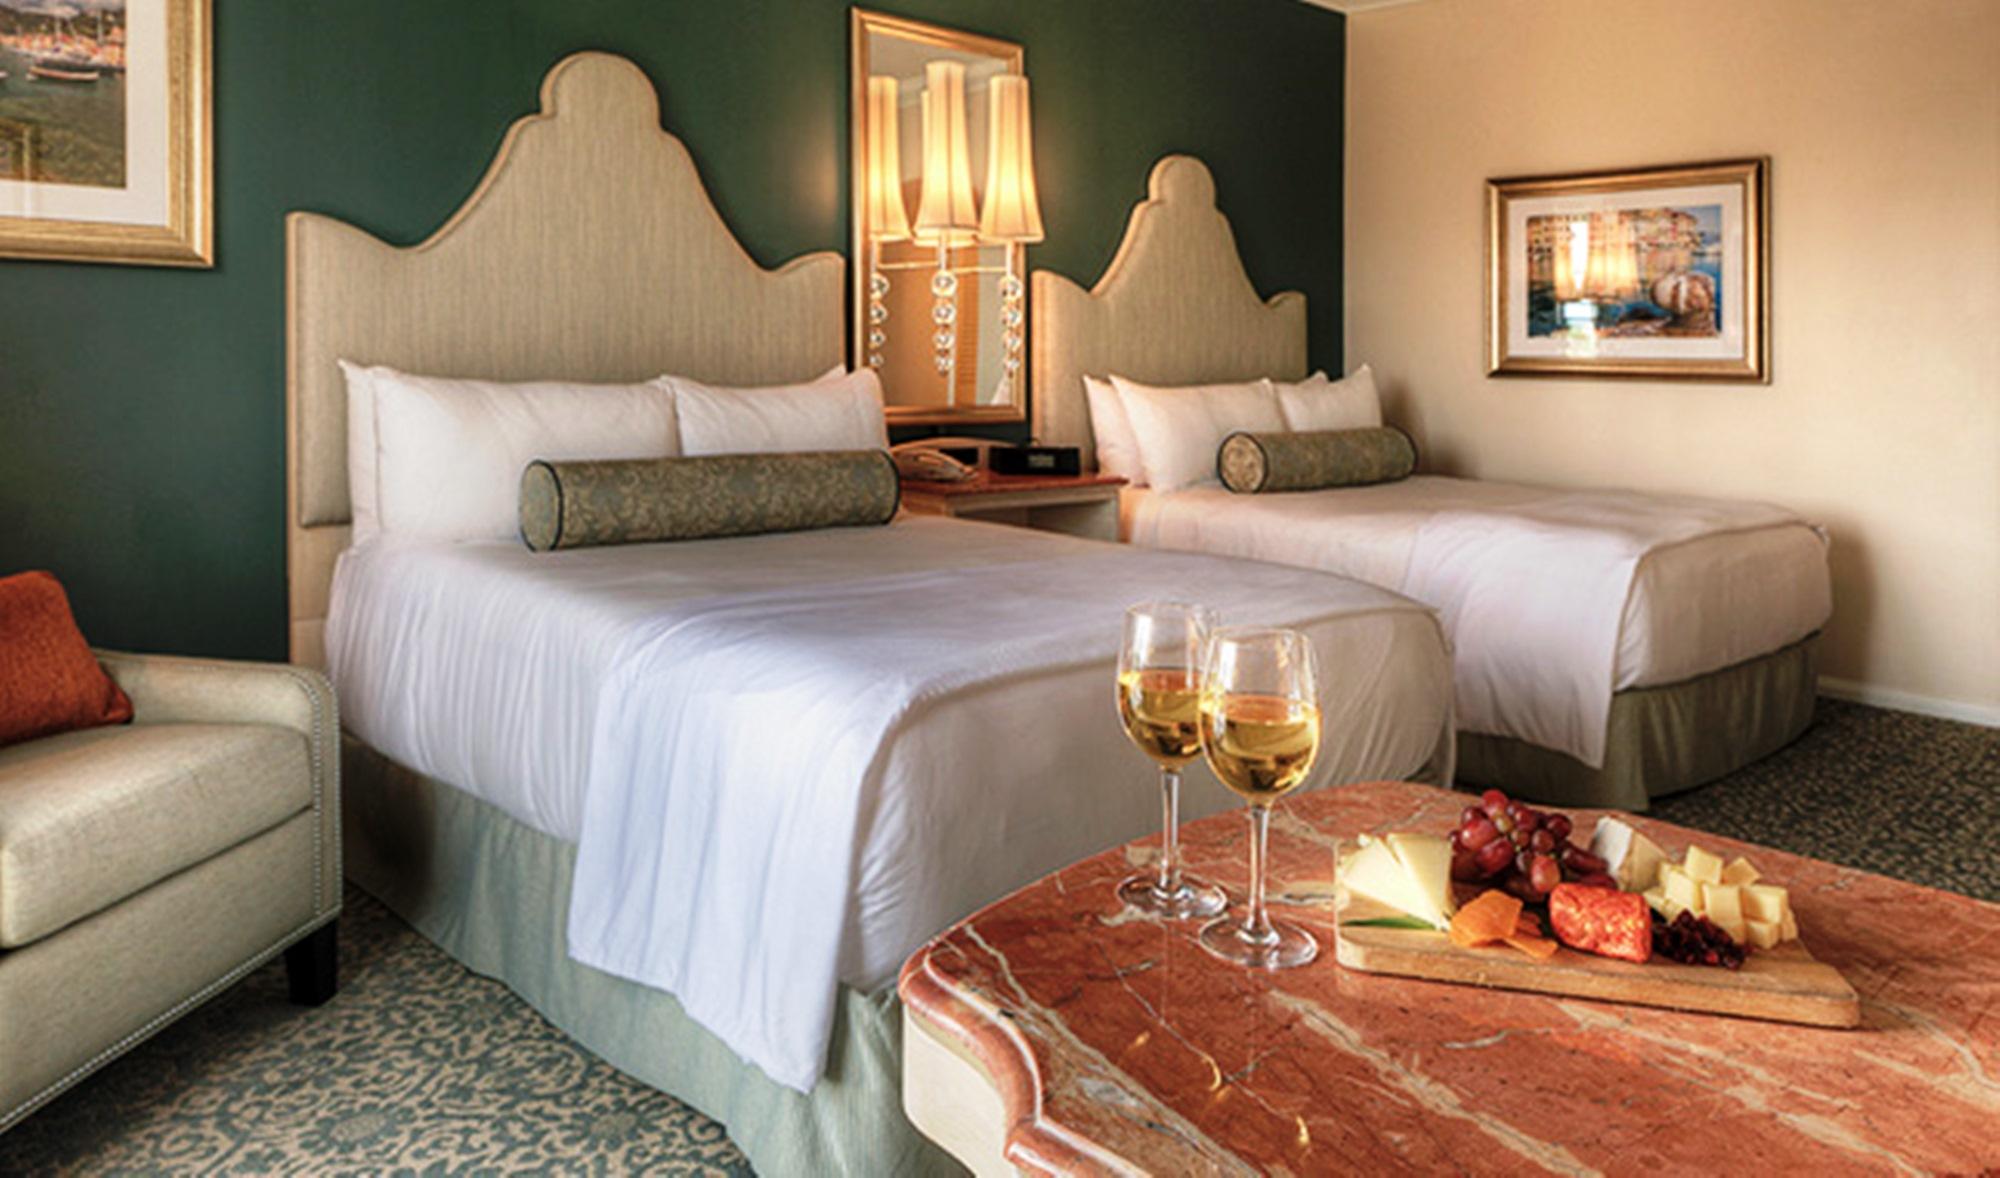 Loews Portofino Bay Hotel: Rooms - complete guide  photo gallery